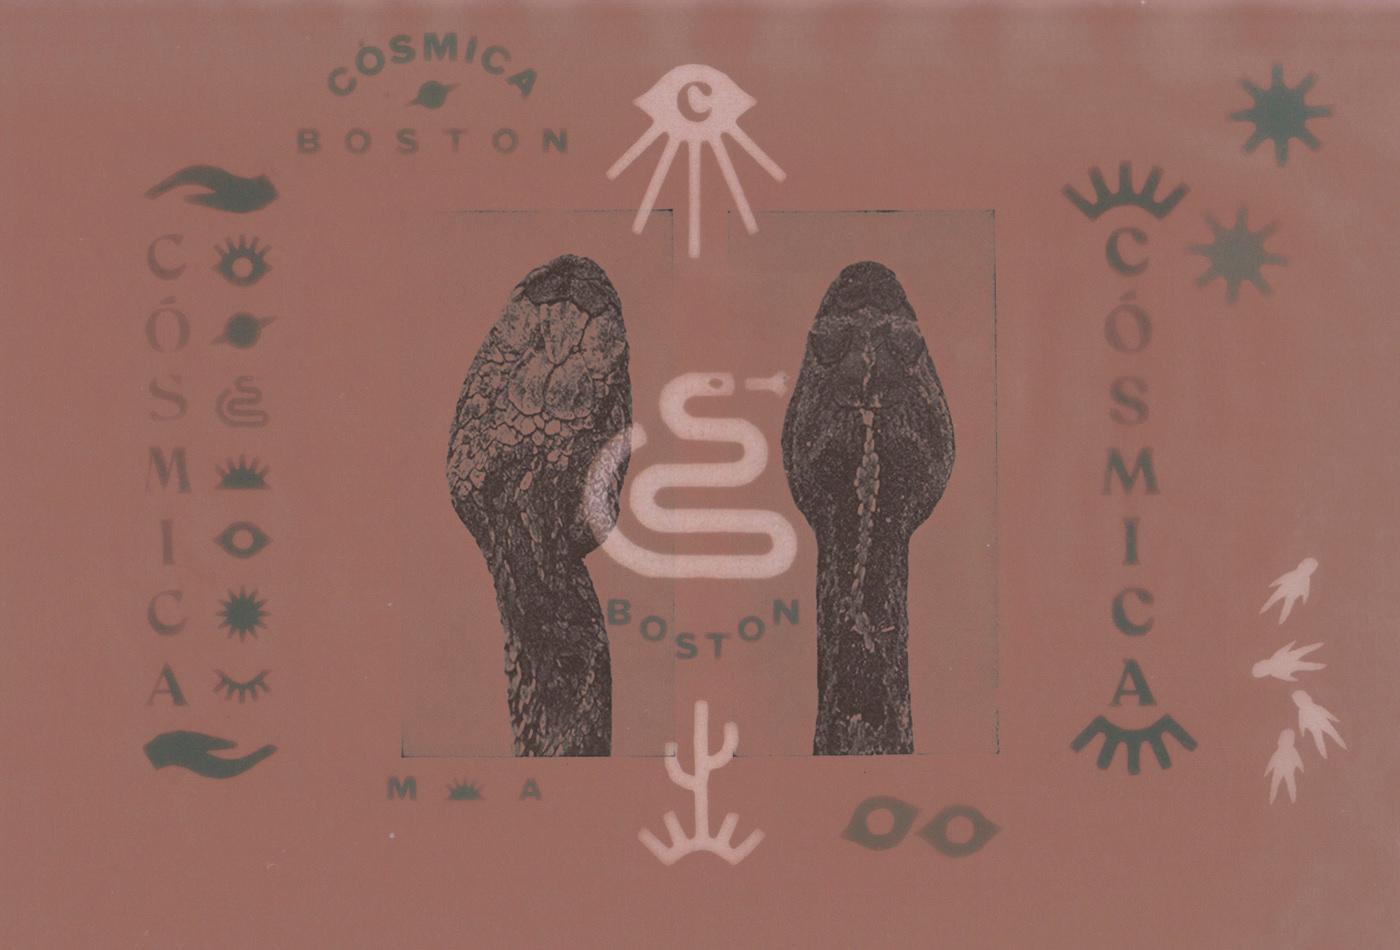 cosmica-boston-snake-casmic-eye-eyes-illuminati-secret-tacos-taco-calmmex-mexican-restaurant-vacaliebres-branding-logo-snake-astronauts